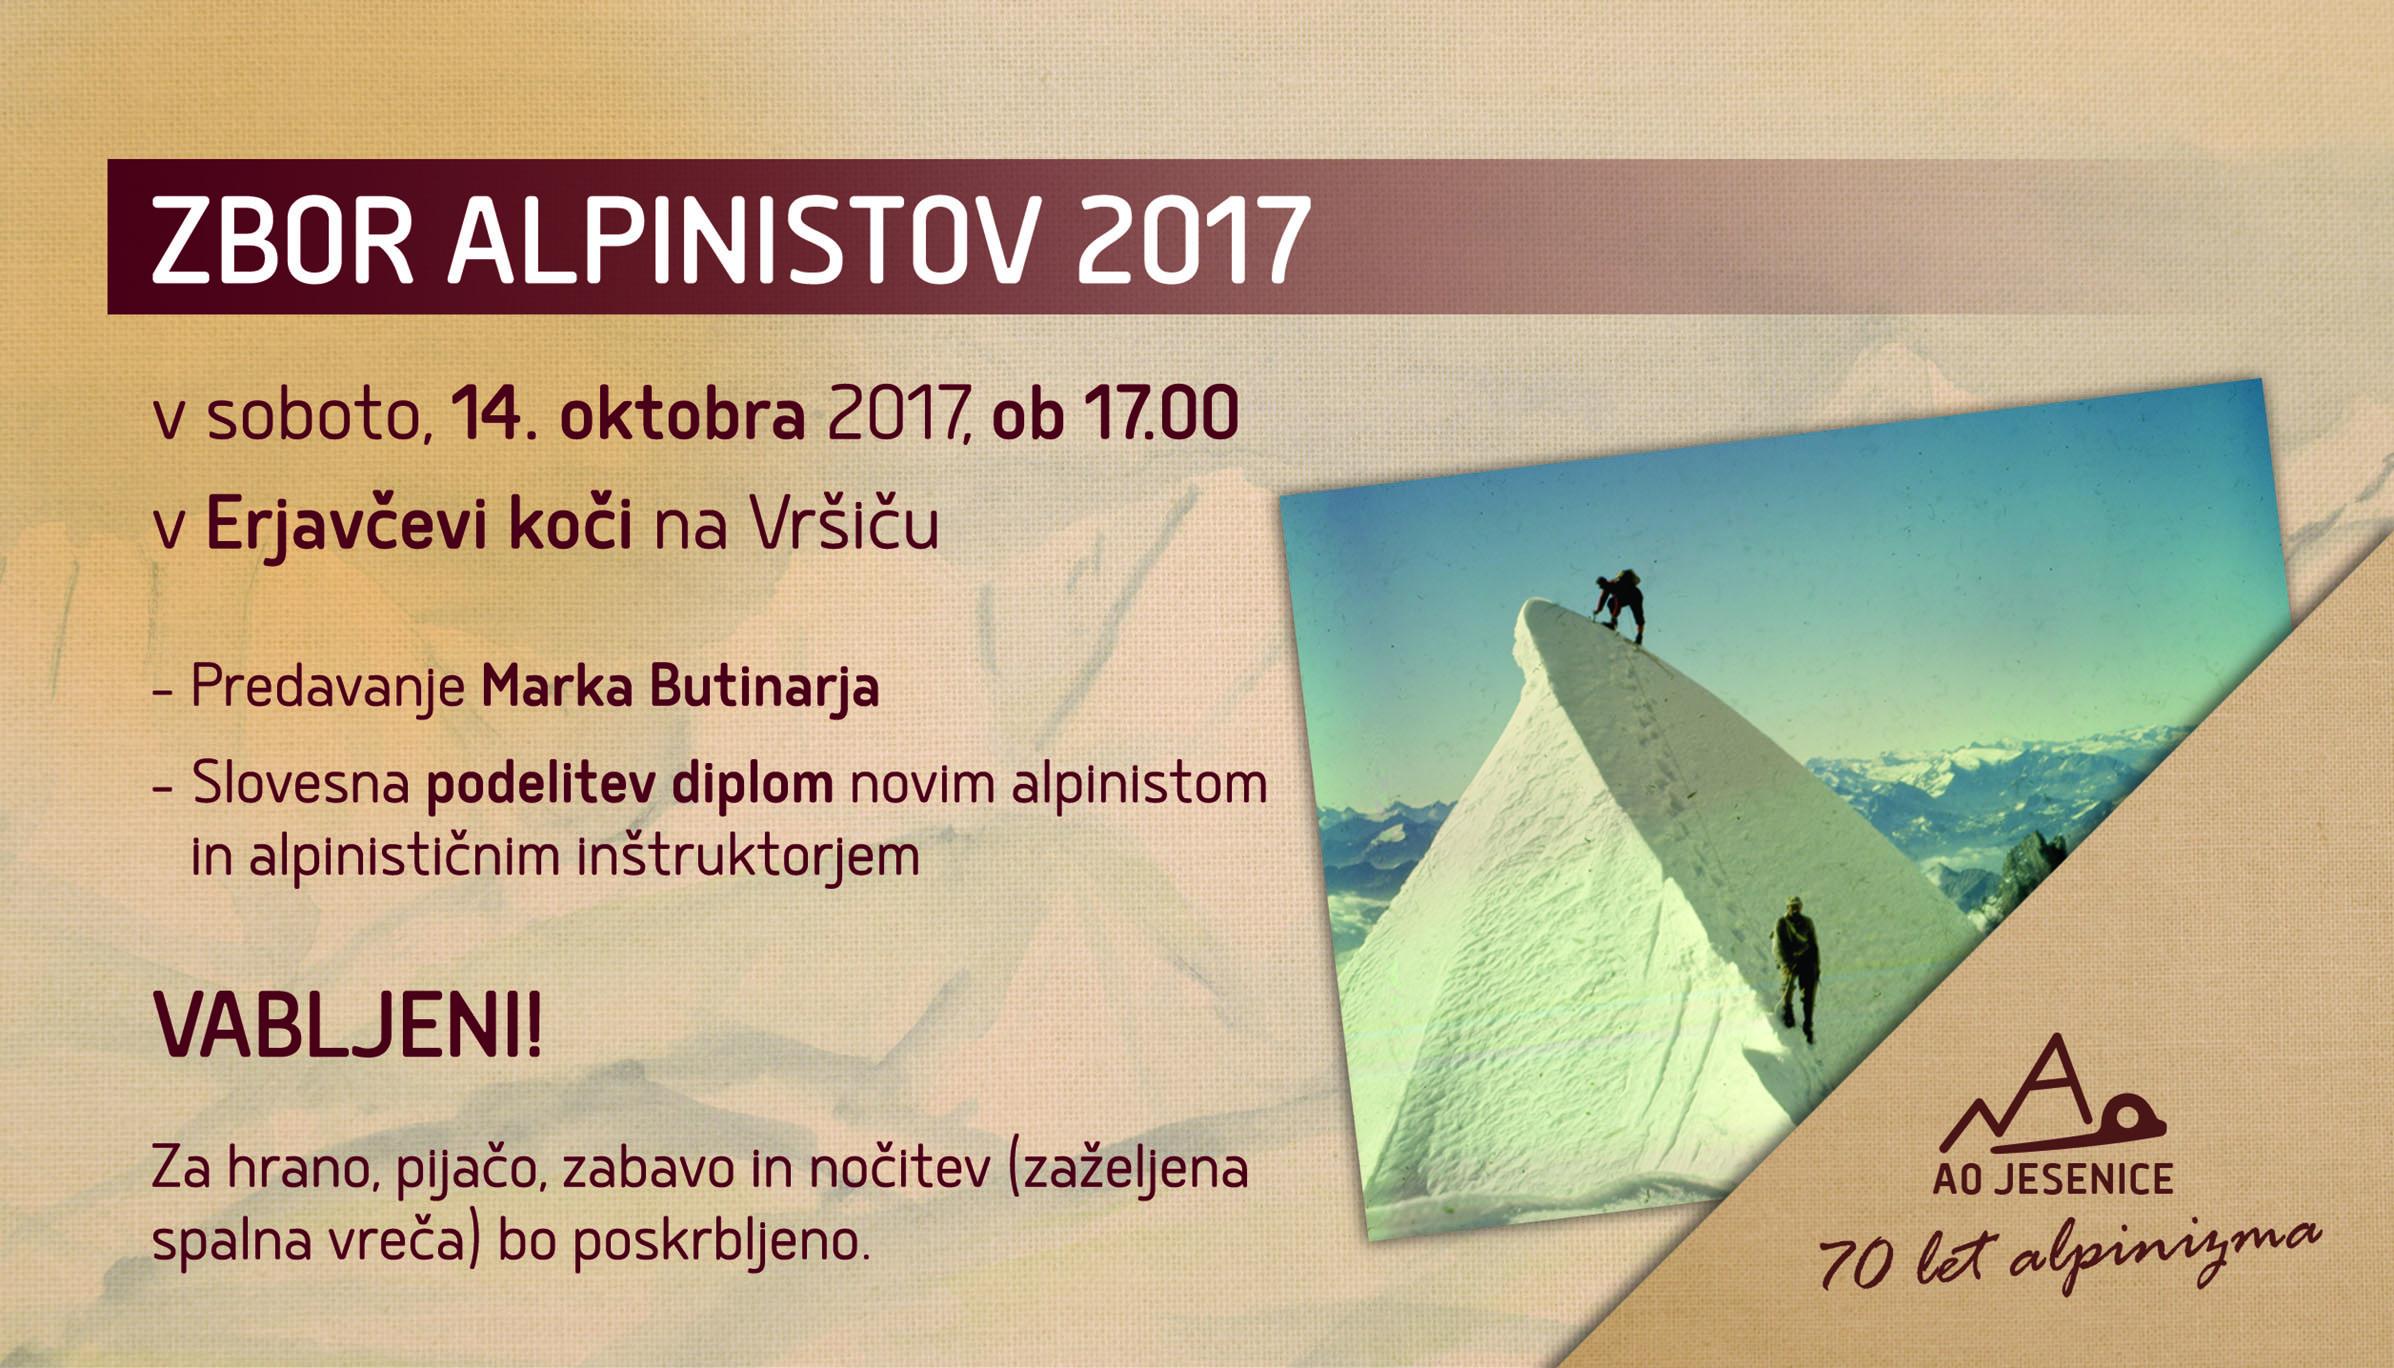 vabilo_zbor_alpinistov